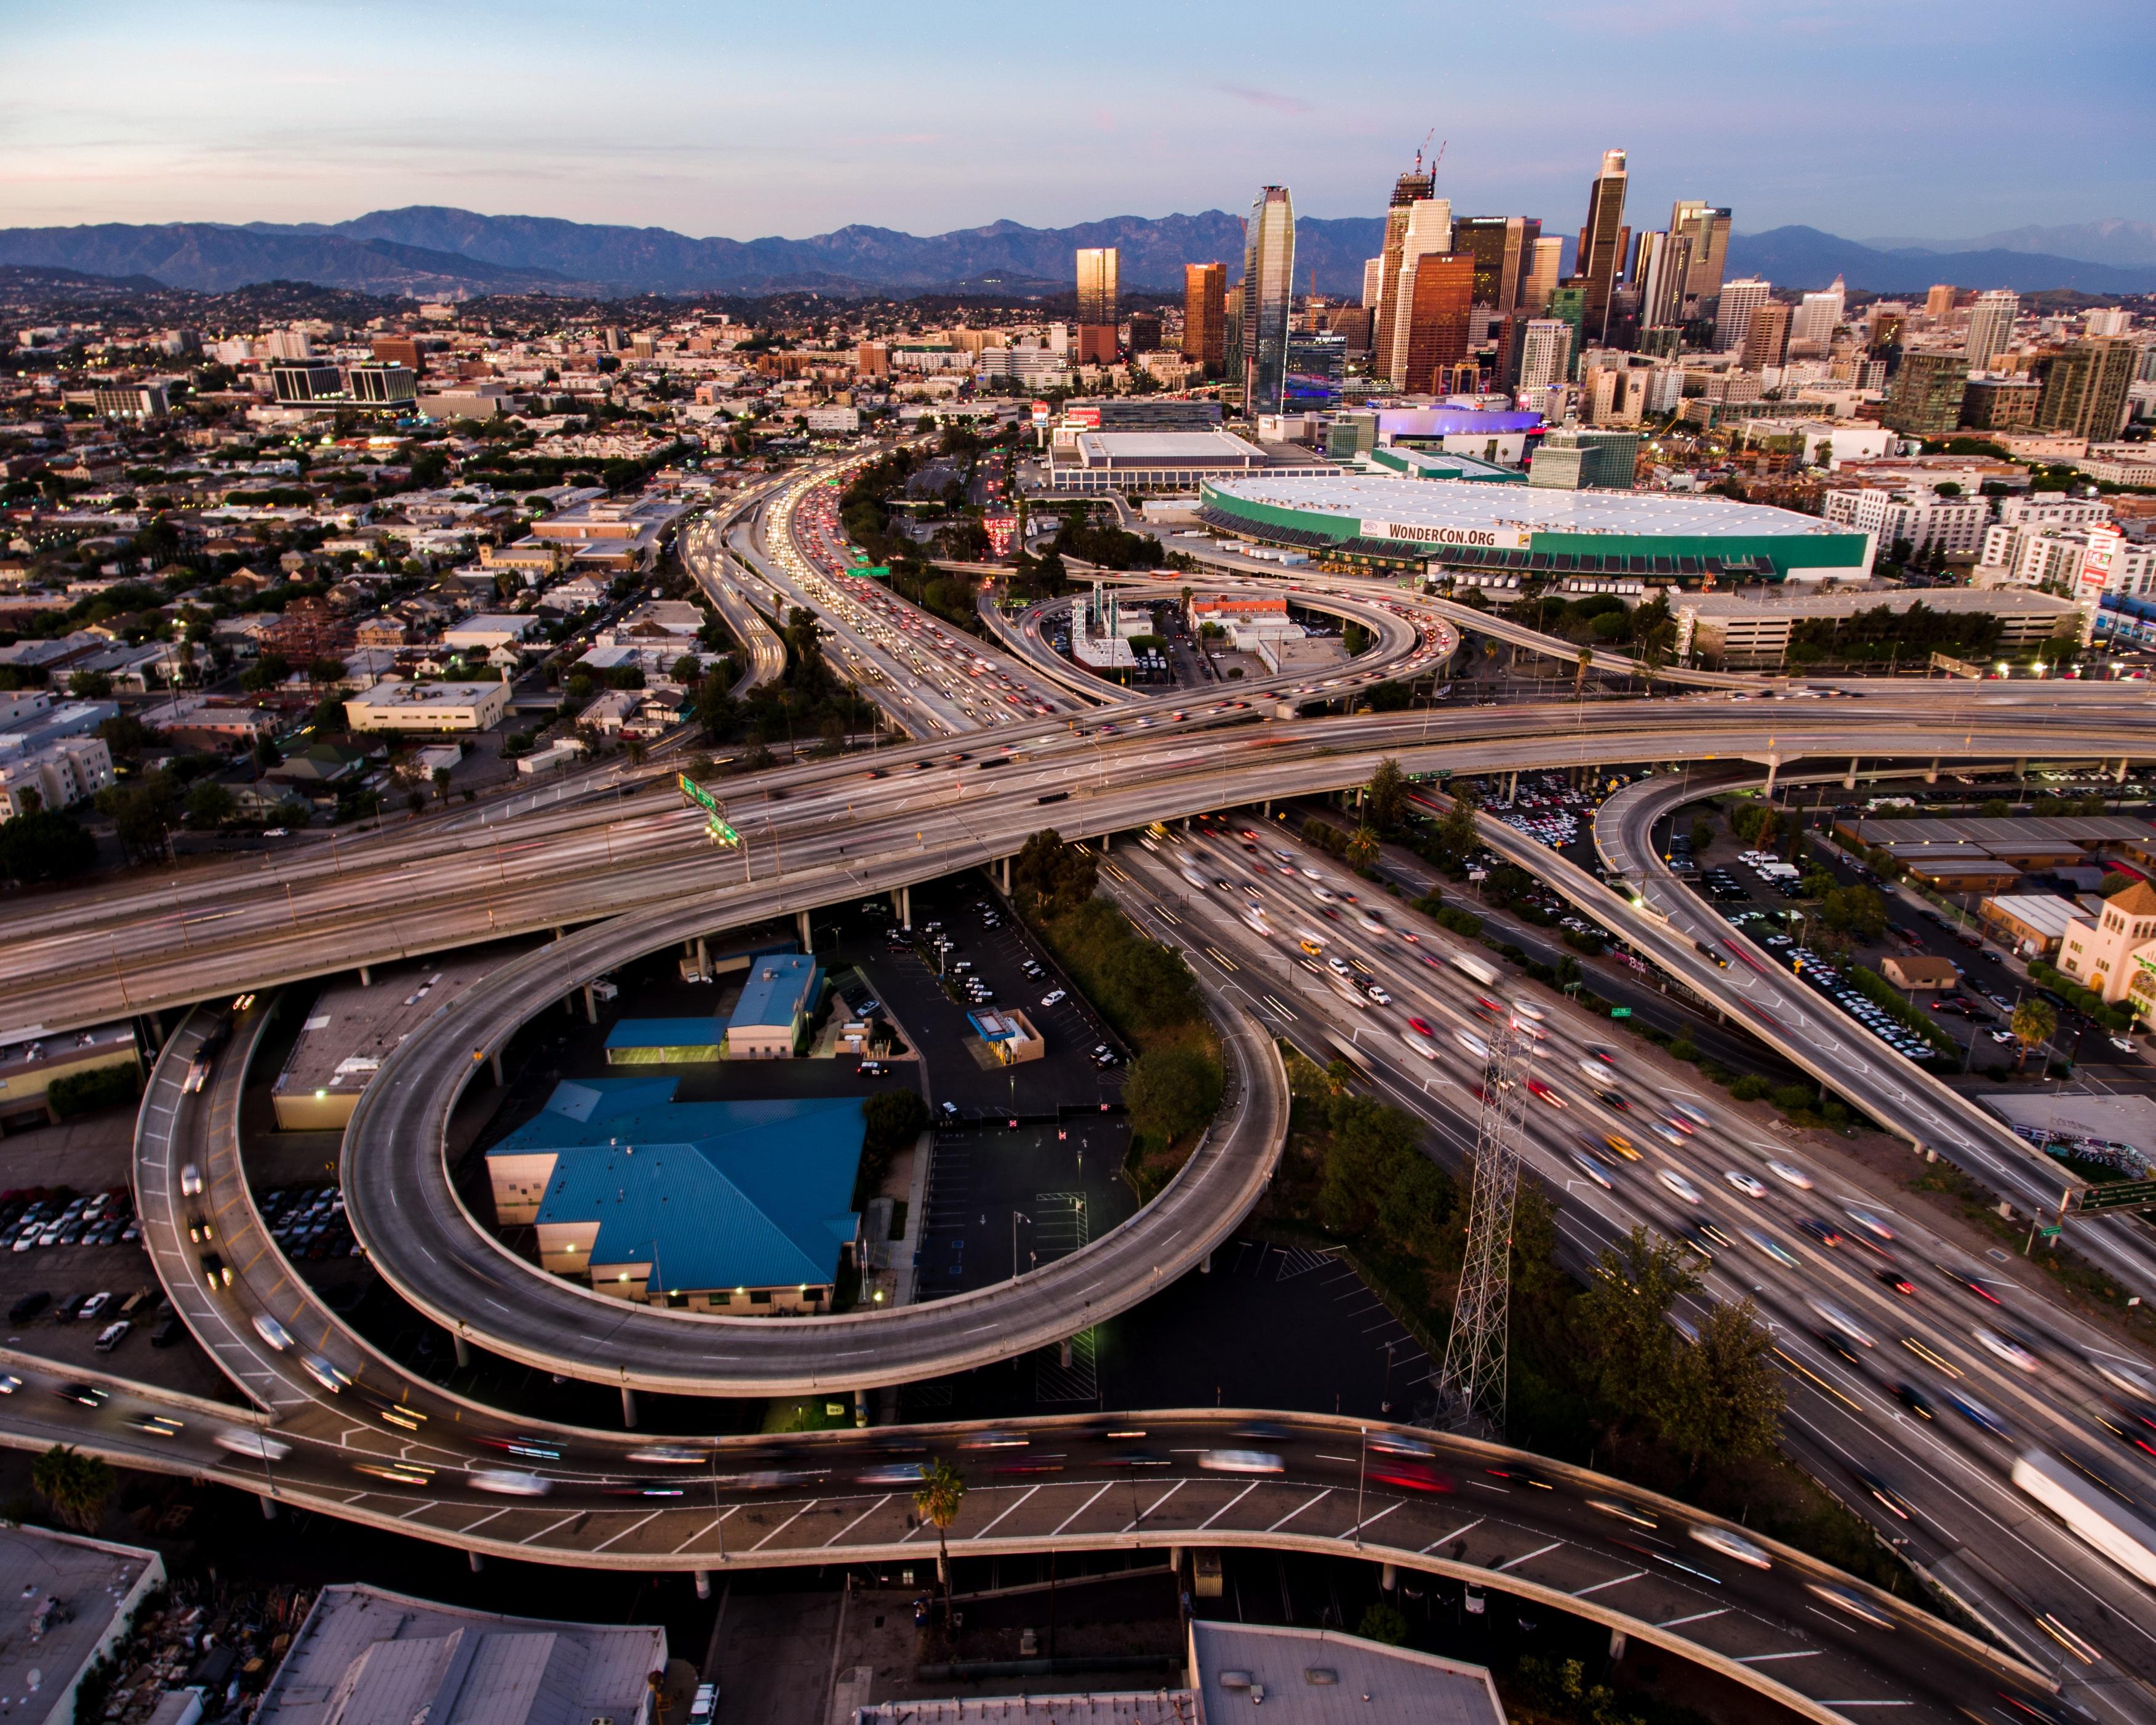 structure-road-bridge-skyline-photography-highway-city-overpass-cityscape-downtown-transport-landmark-public-transport-infrastructure-junction-metropolis-bird's-eye-view-aerial-photography-urban-area-residentia.jpg